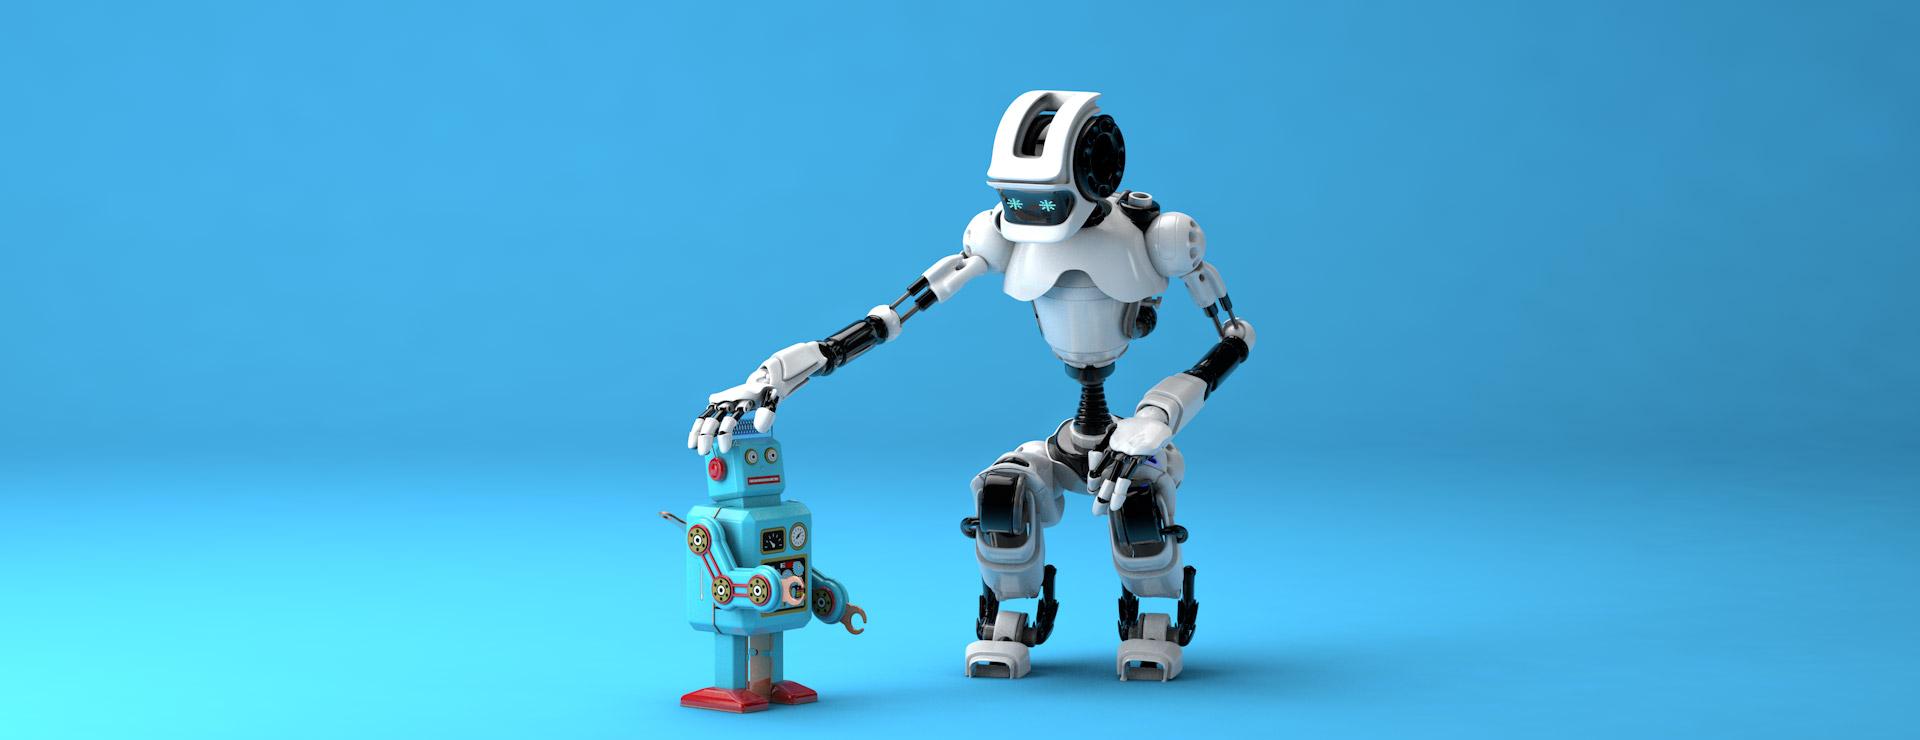 CiGen-RPA-Australia-5-Reasons-Why-Robotic-Process-Automation-is-Your-Competitive-Advantage.jpg